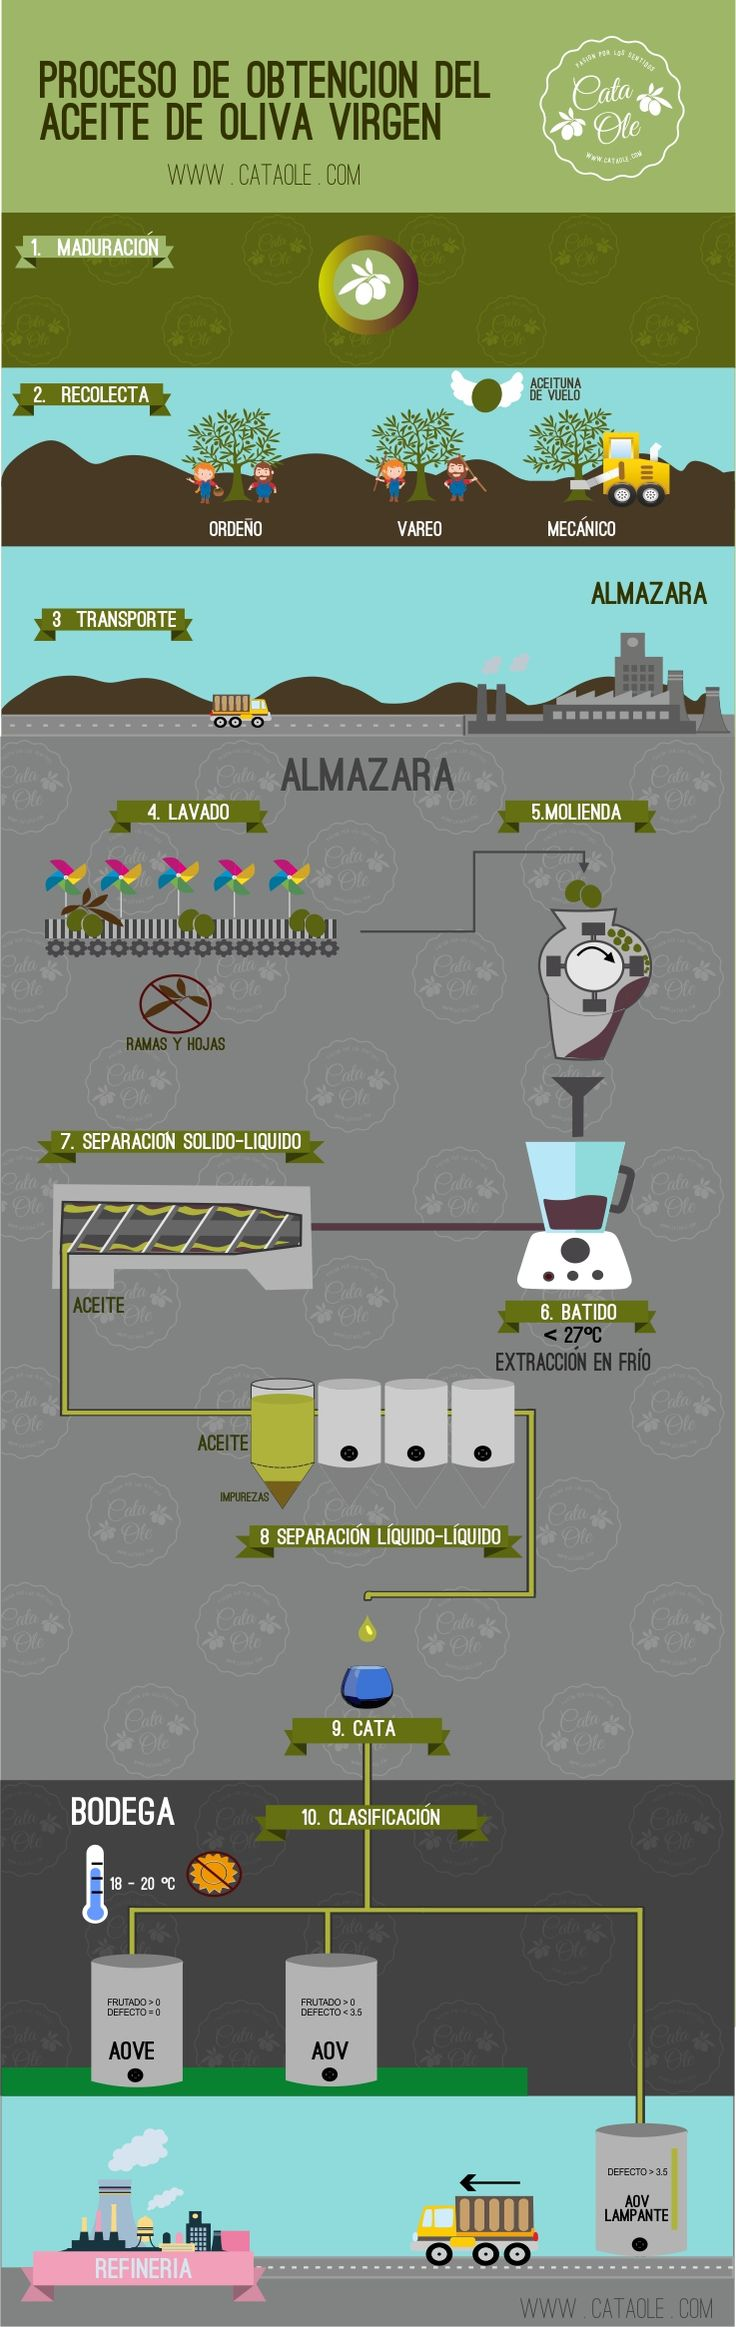 infografia_obtencion_clasificacion_aceites_olivas_virgen_aove_aov_lampante_